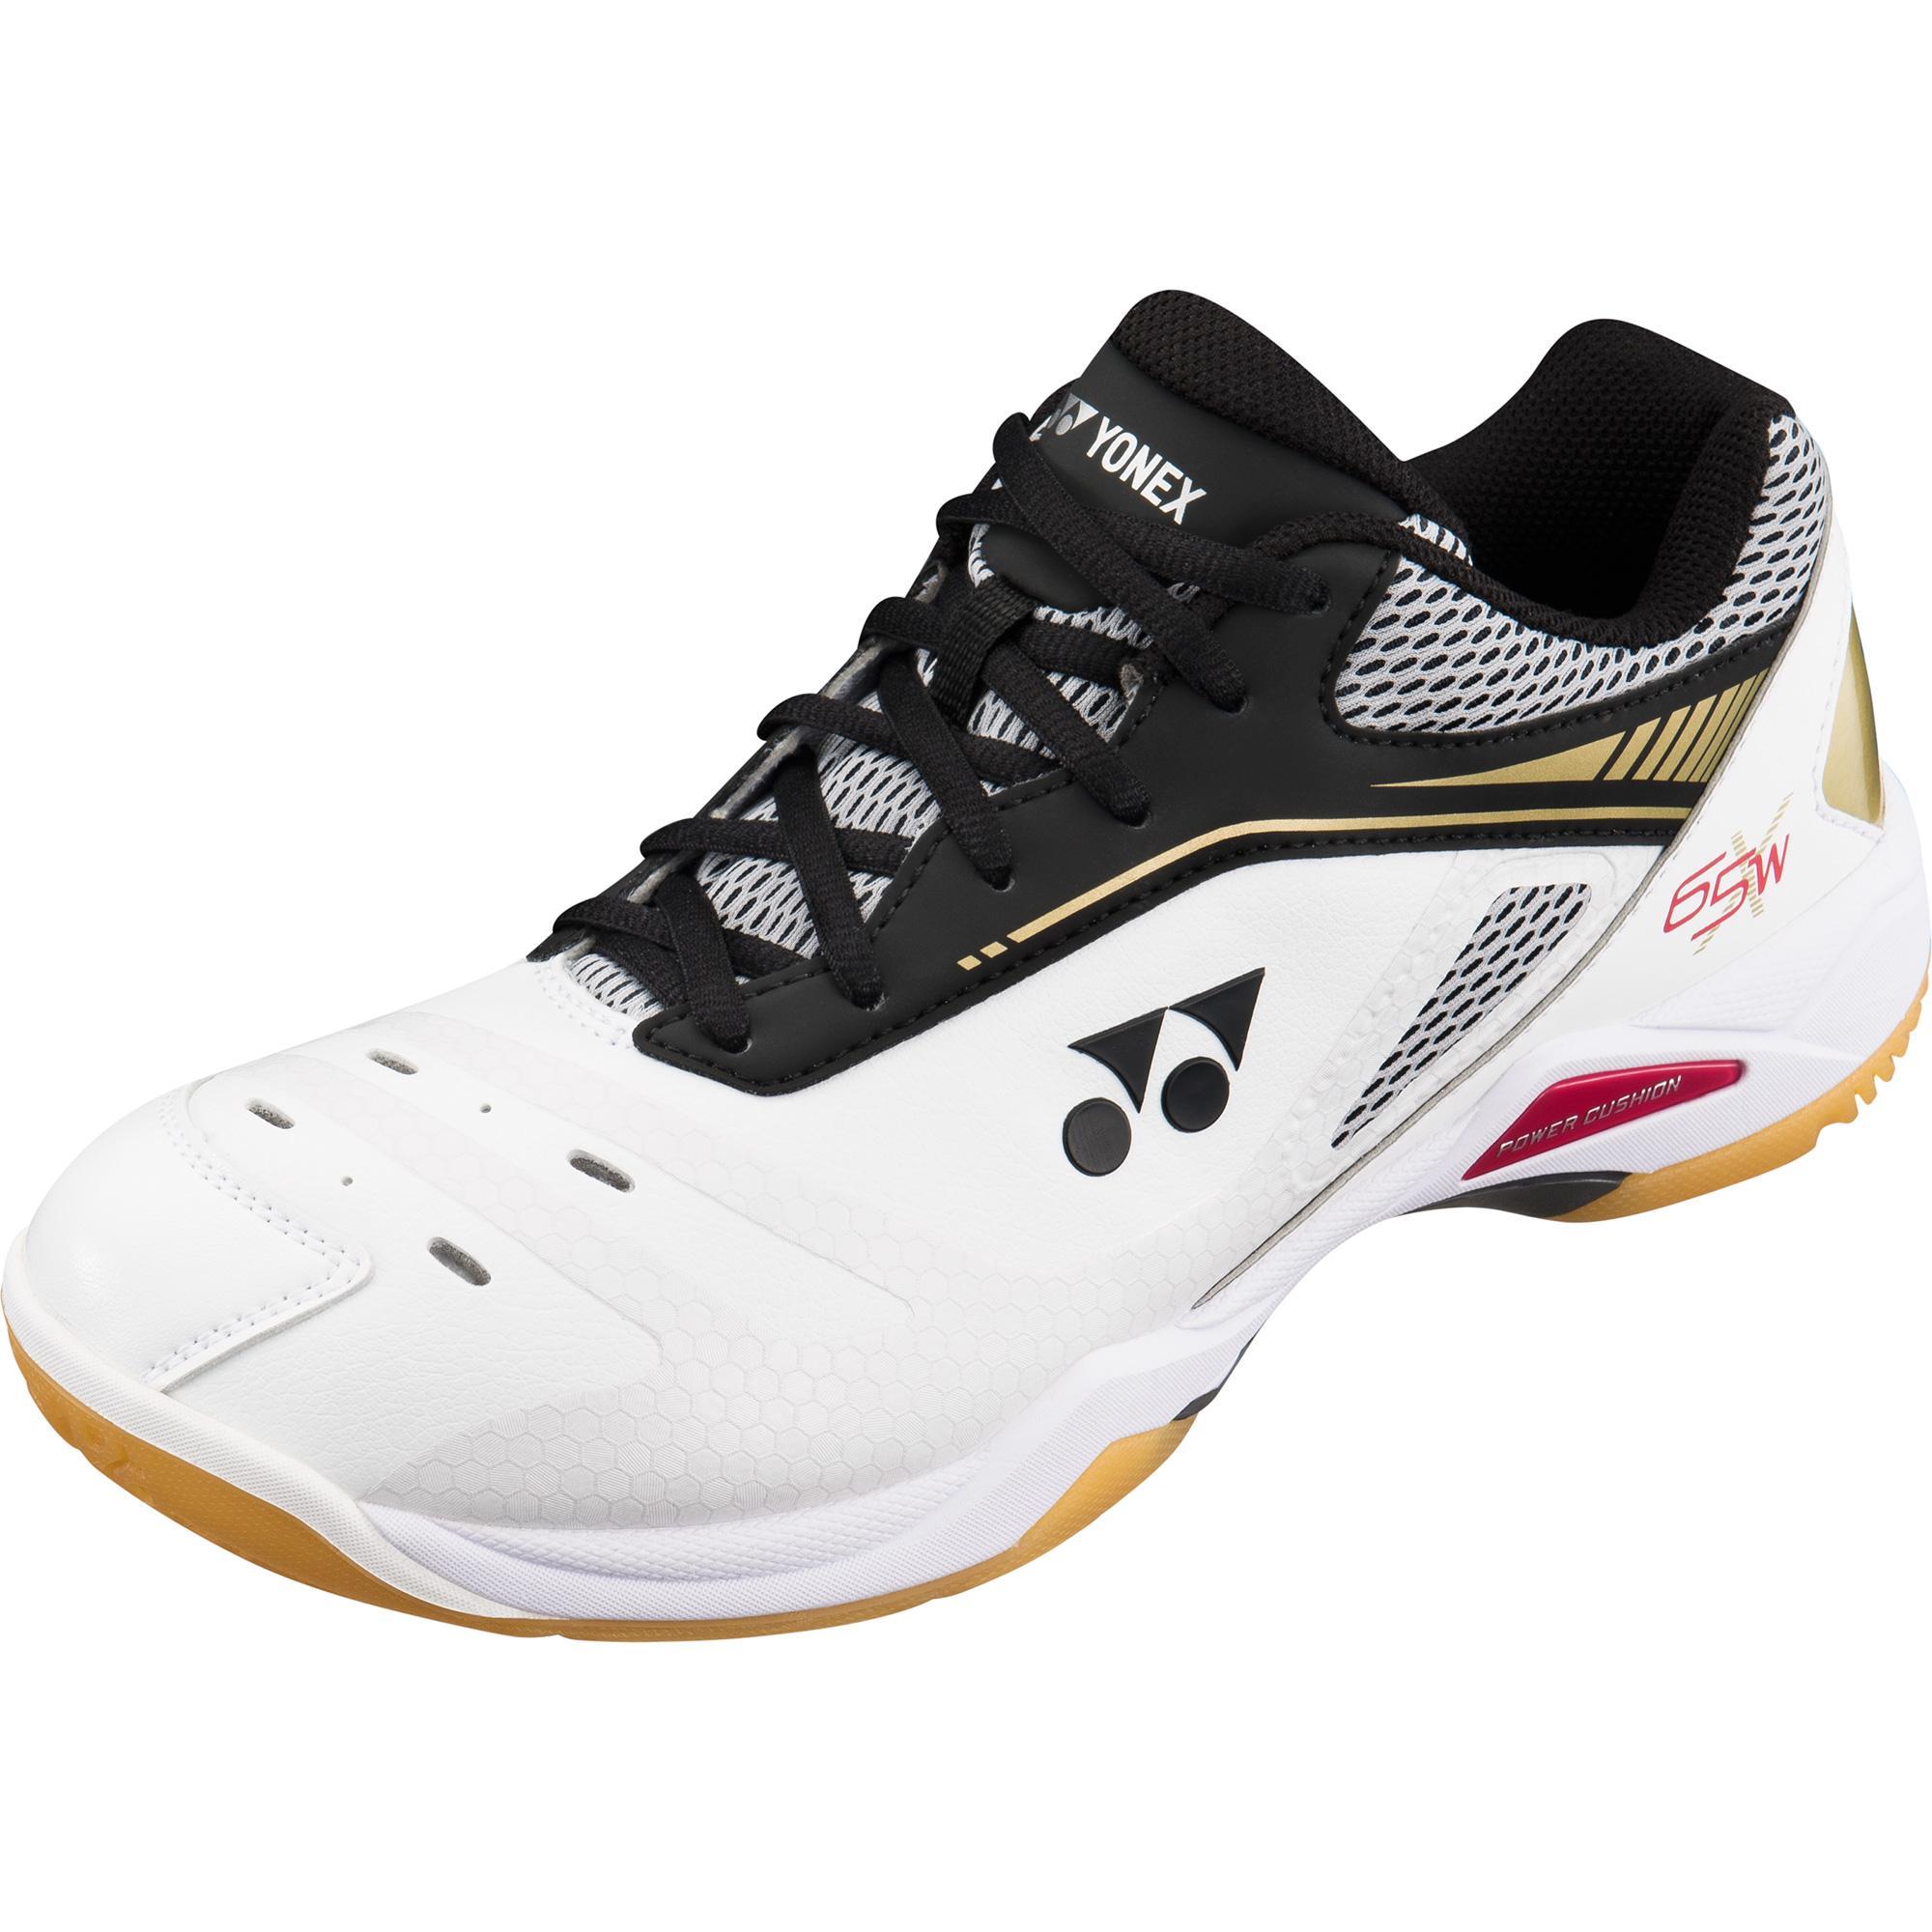 c21de138c33 Yonex Mens Power Cushion 65 X Wide Badminton Shoes - White Gold -  Tennisnuts.com